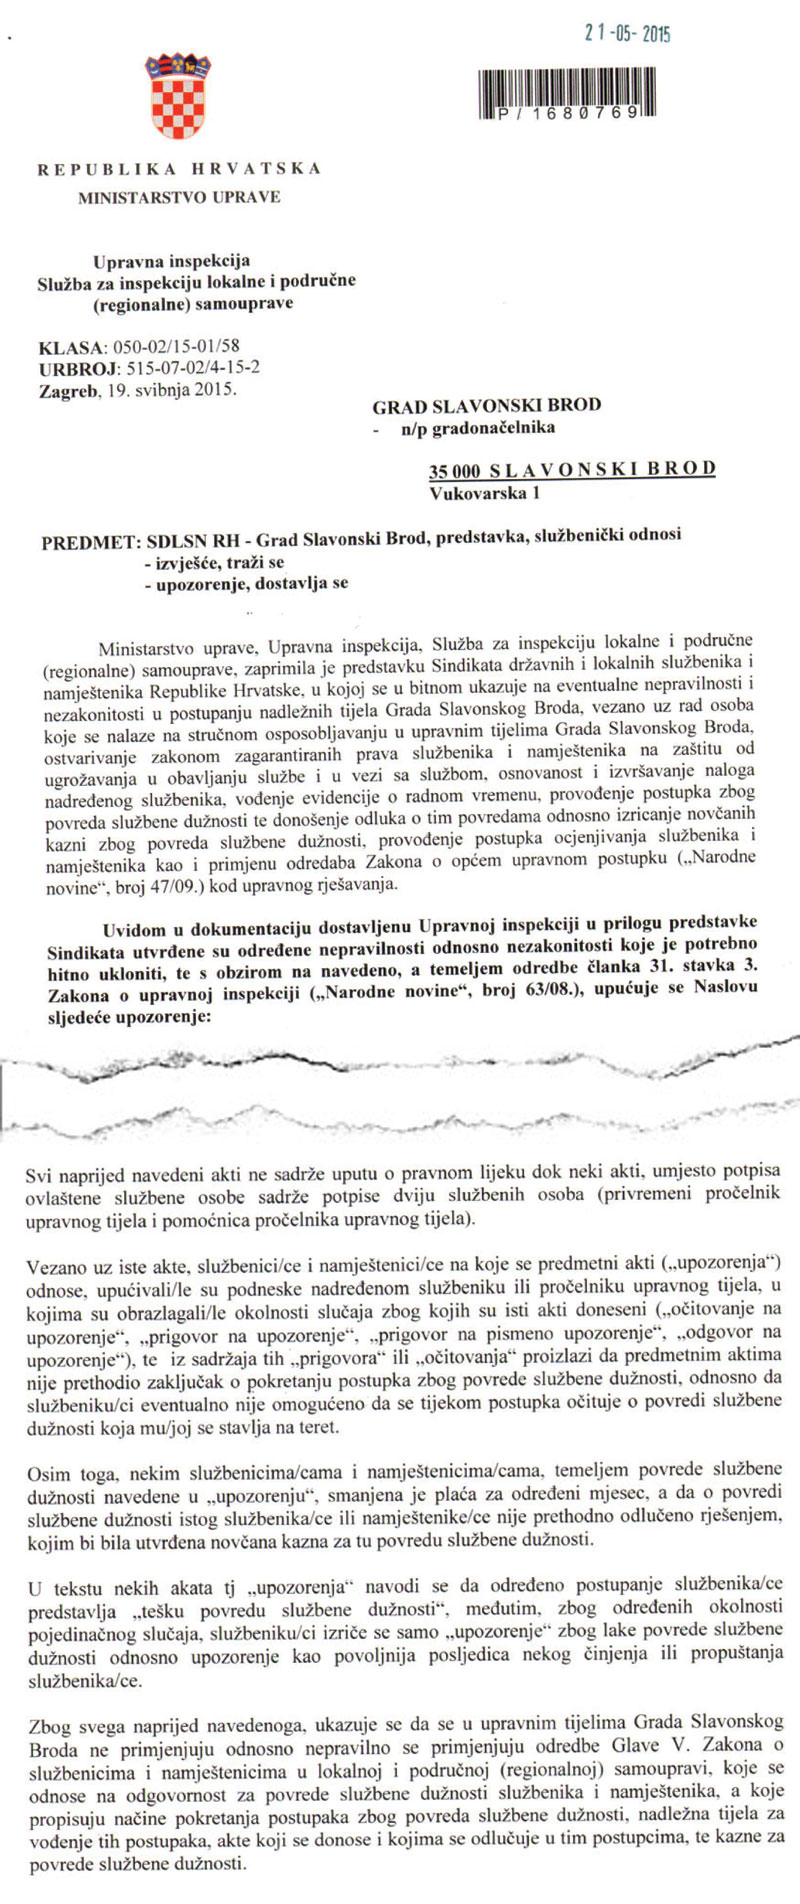 Slavonski Brod te tuži, sudi i kažnjava